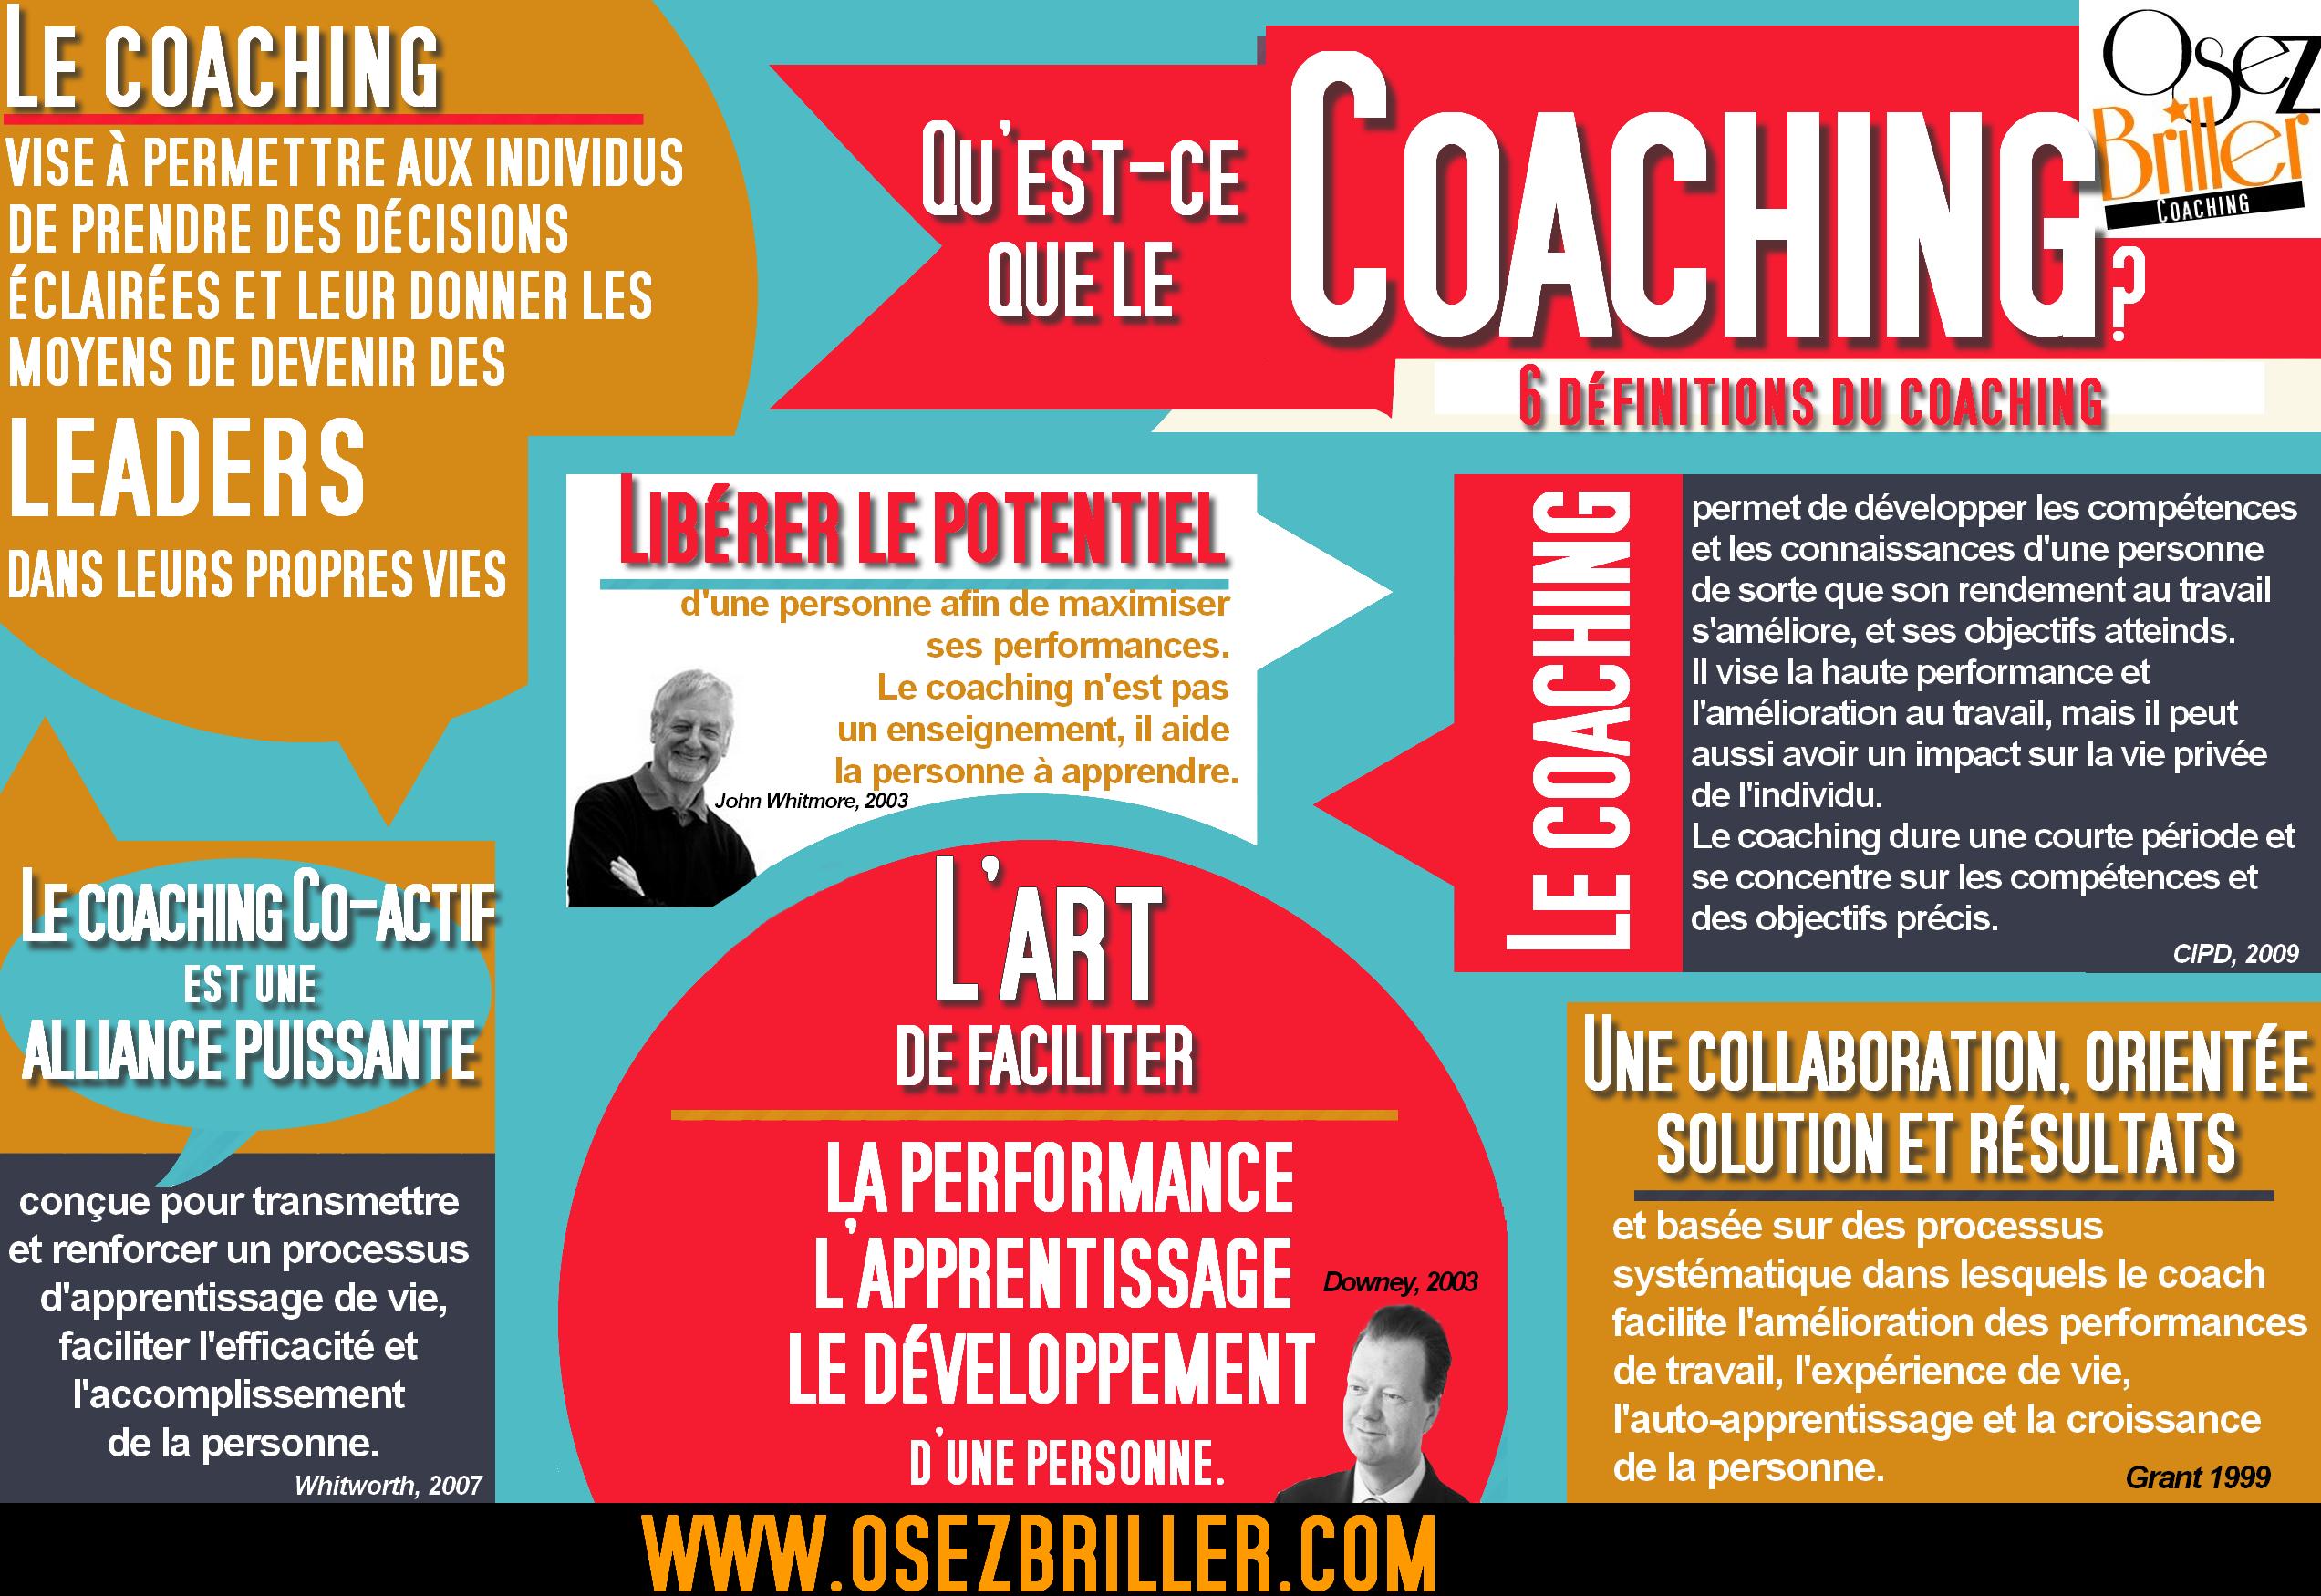 d u00e9finition du coaching   qu u0026 39 est